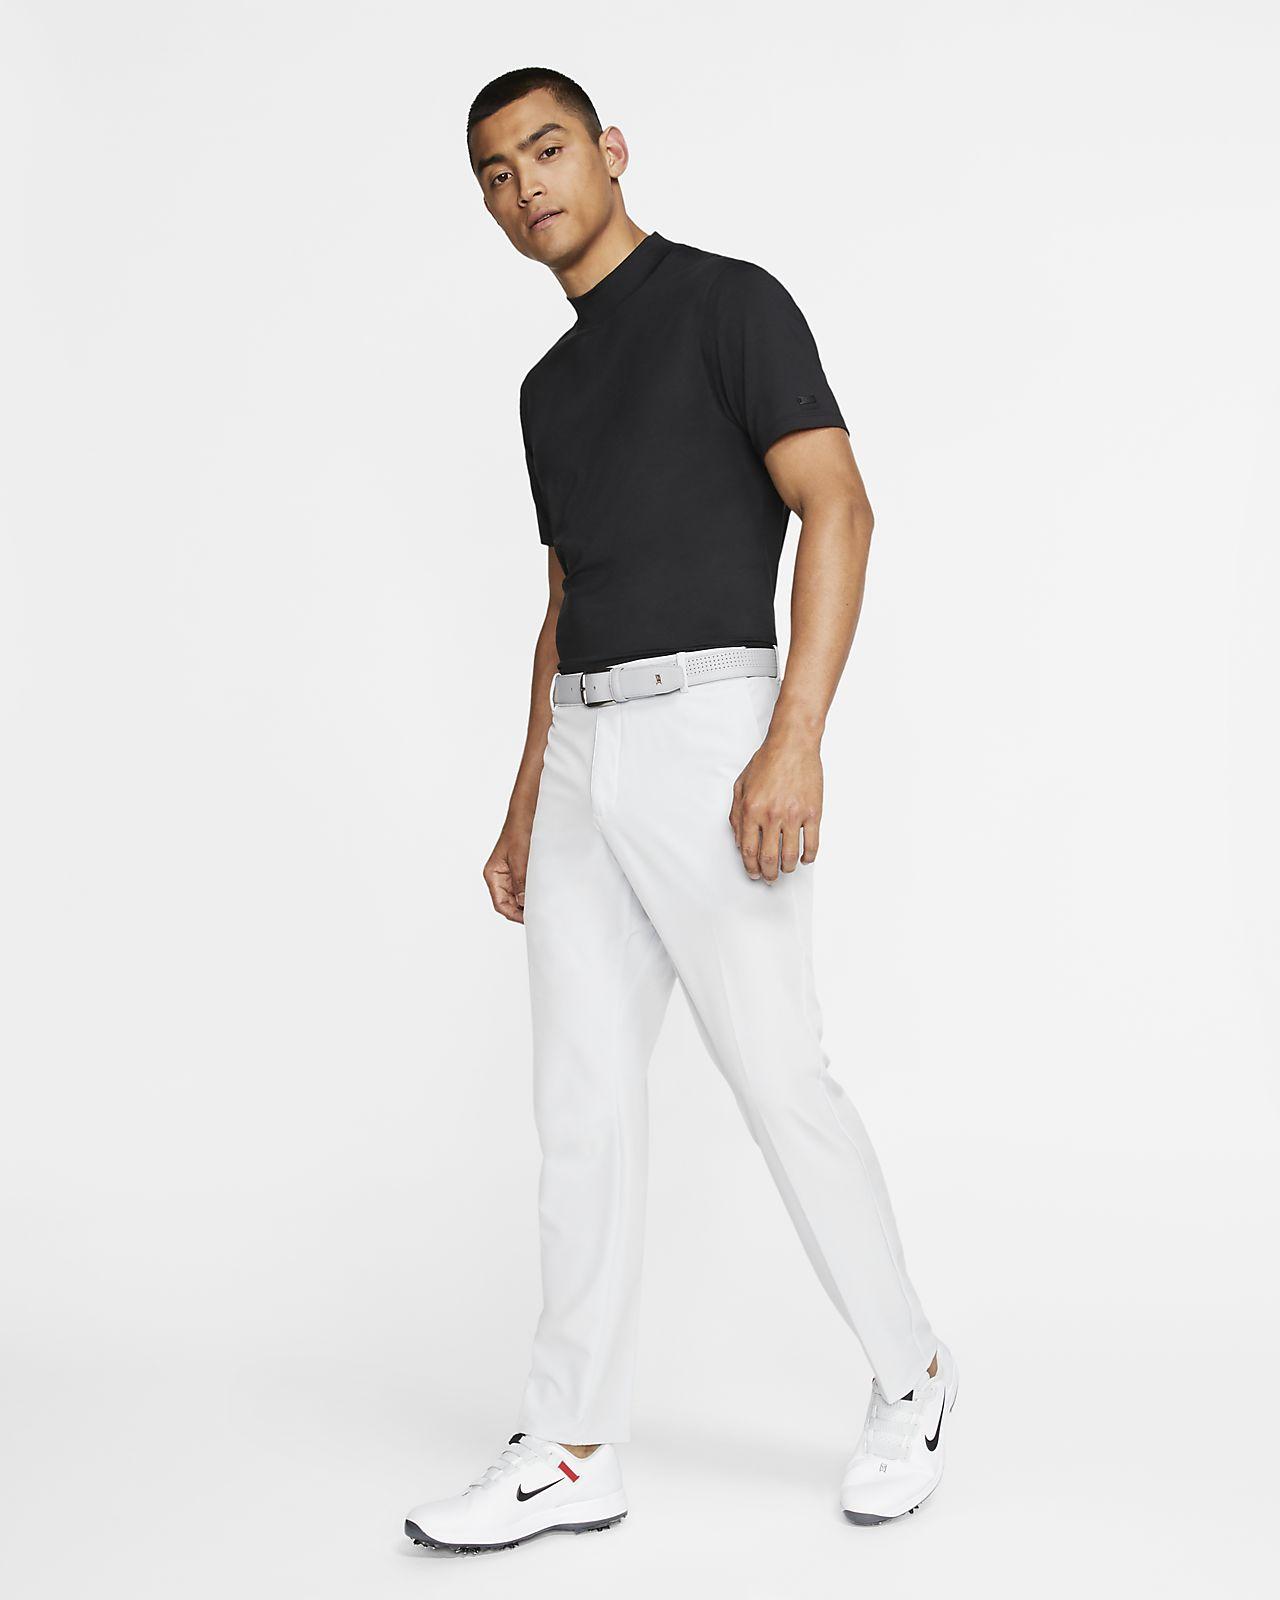 4471aefc Nike Dri-FIT Tiger Woods Vapor Men's Mock-Neck Golf Top. Nike.com